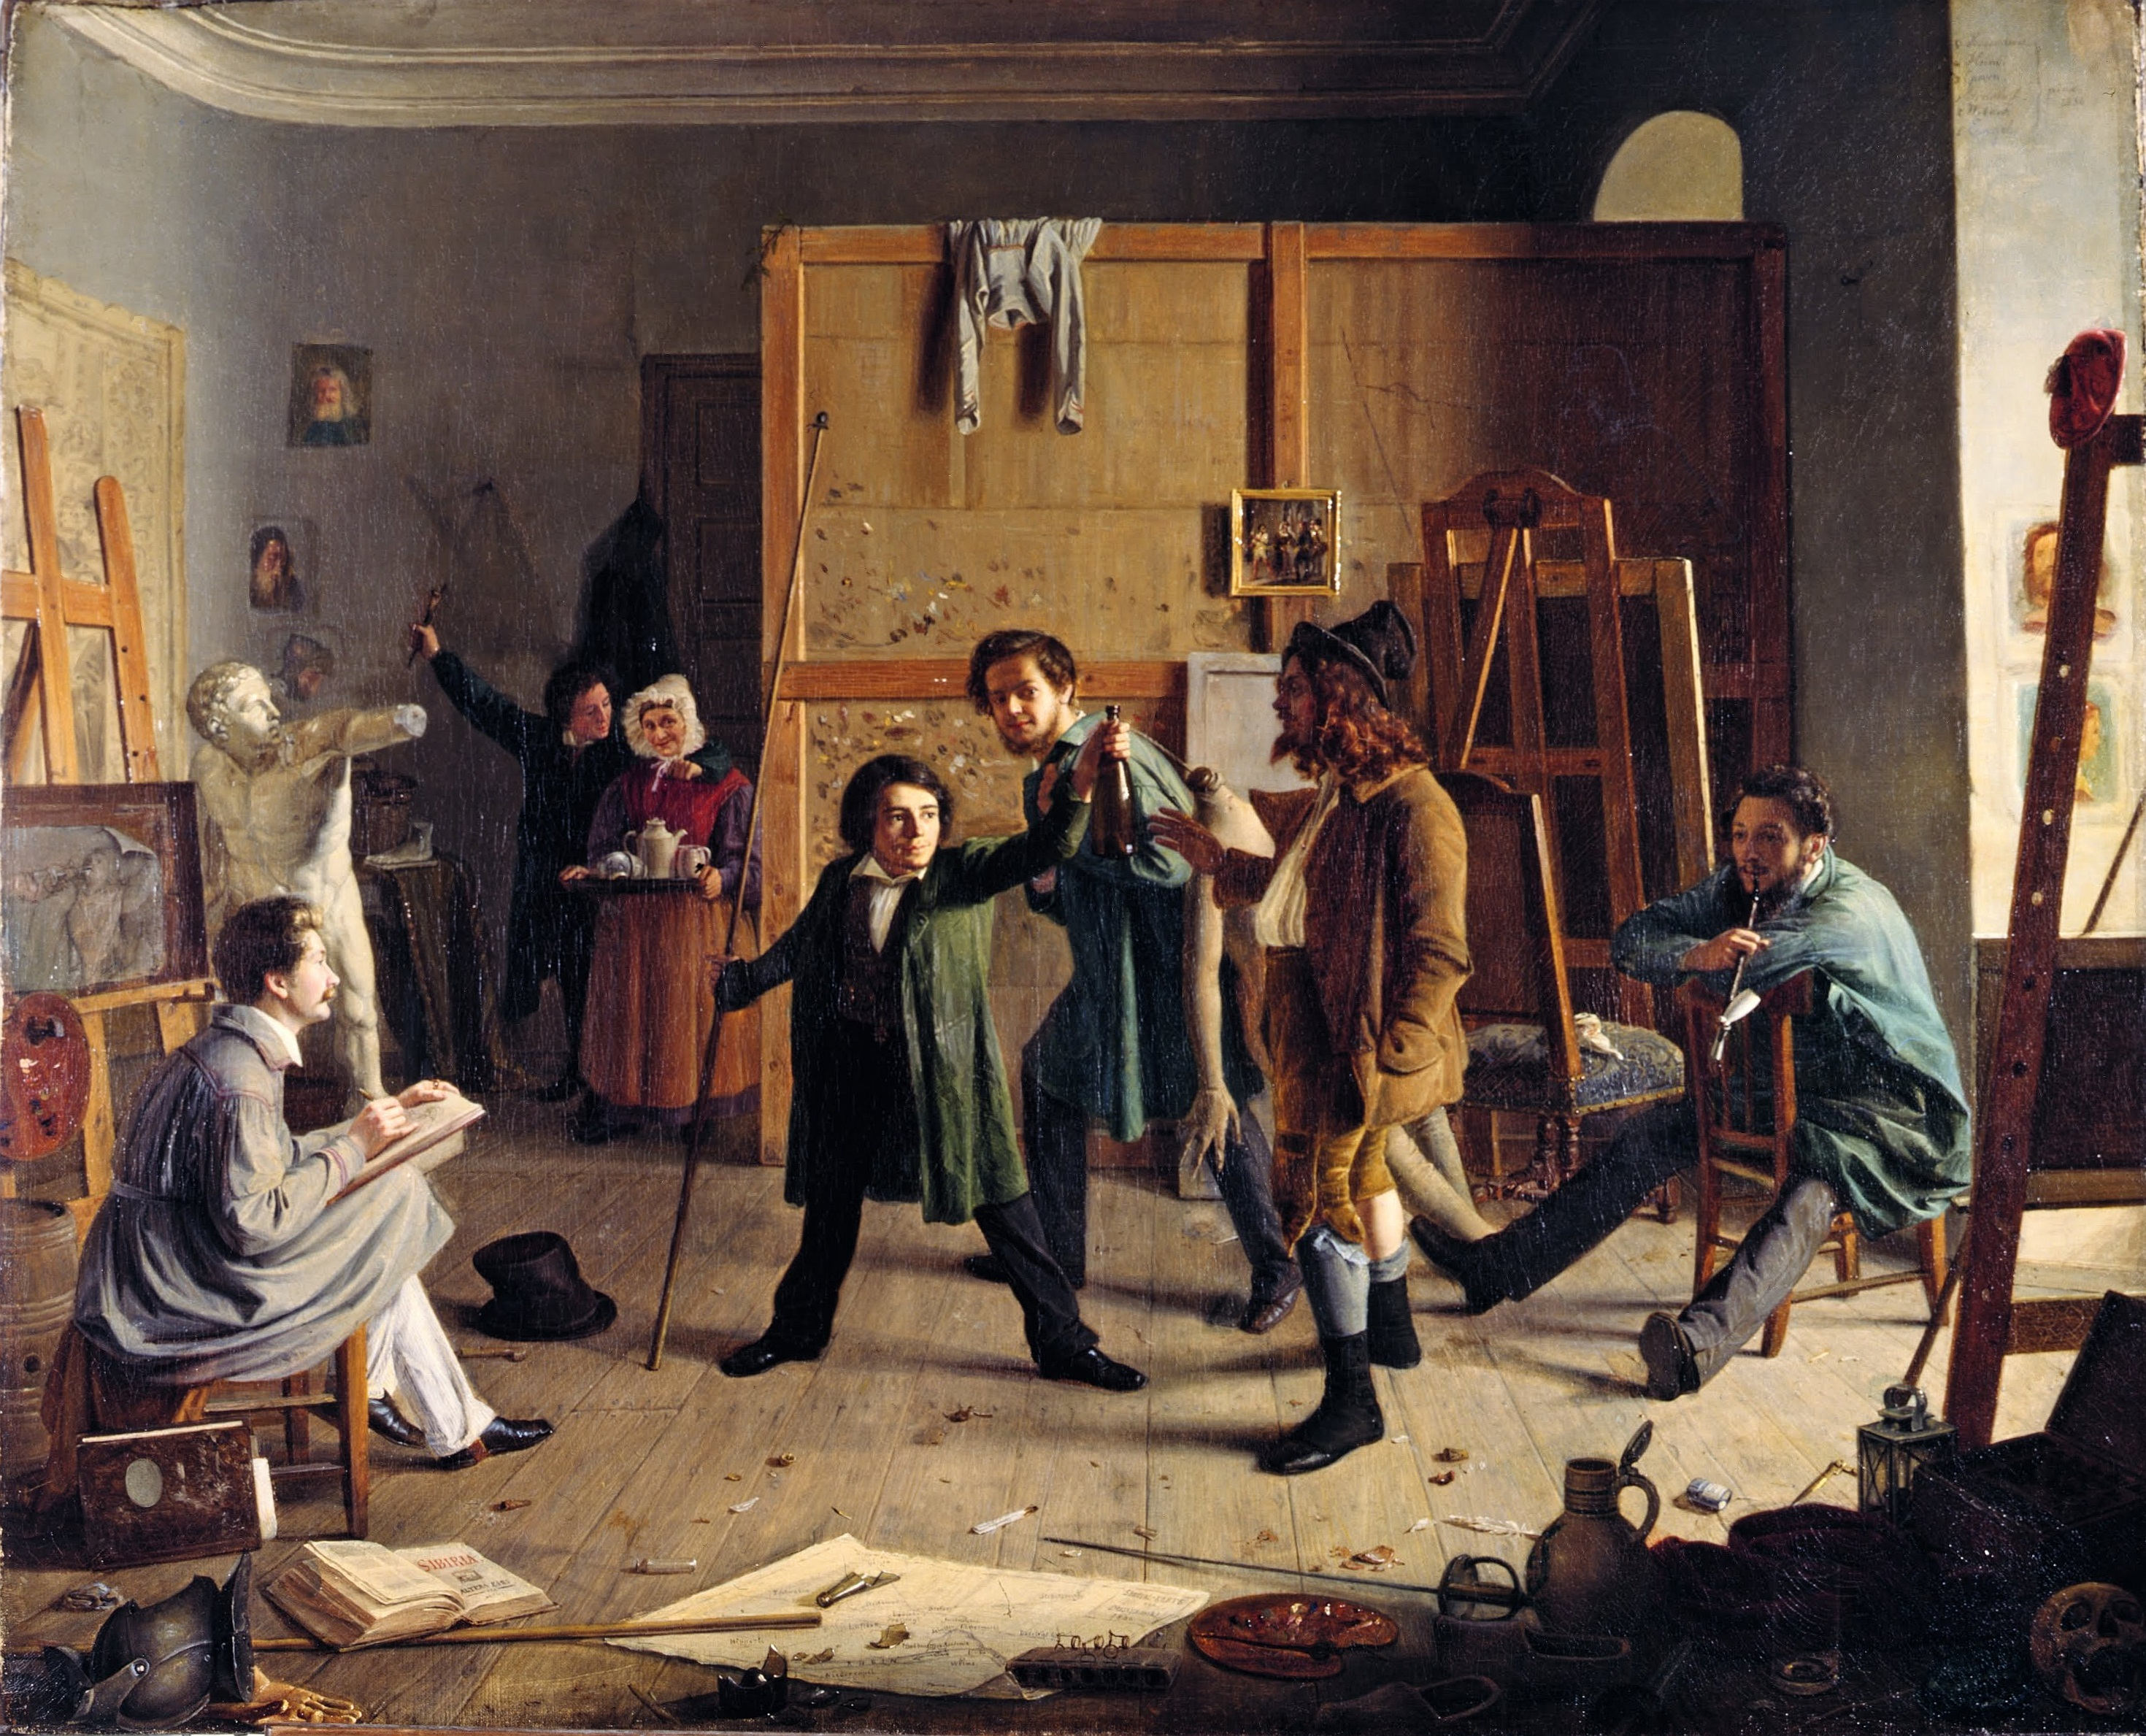 Johann_Peter_Hasenclever,_Atelierszene_1836 Museum Kunstpalast Dusseldorf